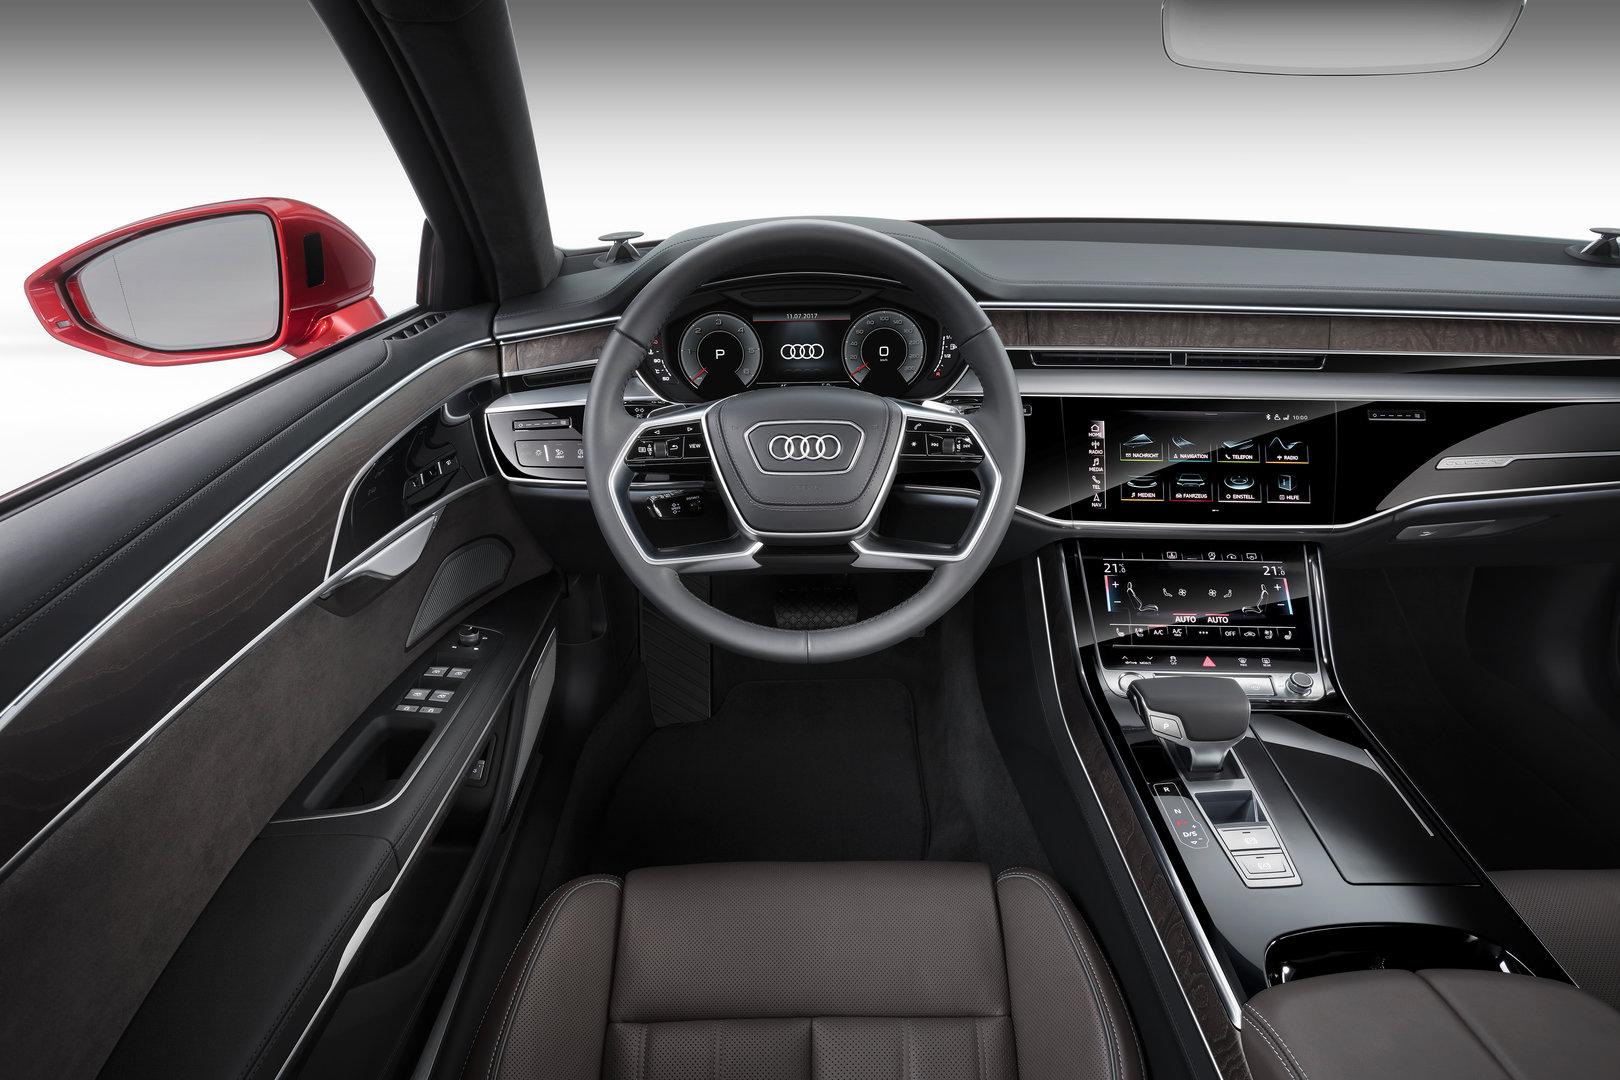 Audi A8 Interieur (Bild 48/69) - ComputerBase